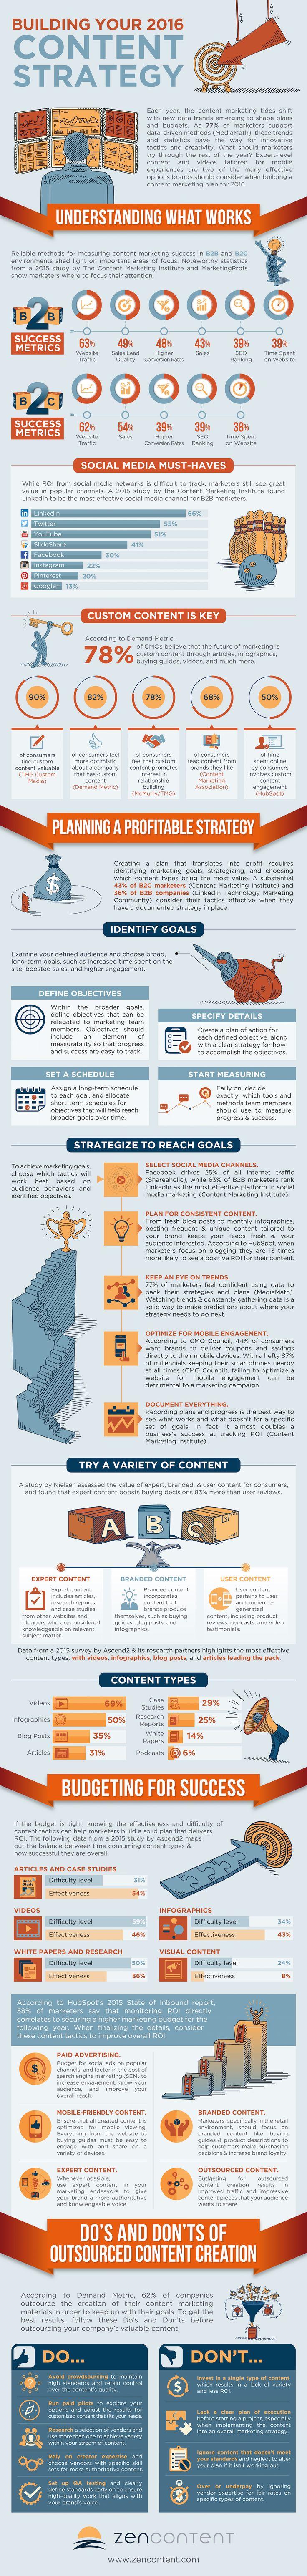 Building Your 2016 #Content Strategy! #Social Media #Digital   #Marketing #Business #Entrepreneur #Web #Startup  #Entreprise